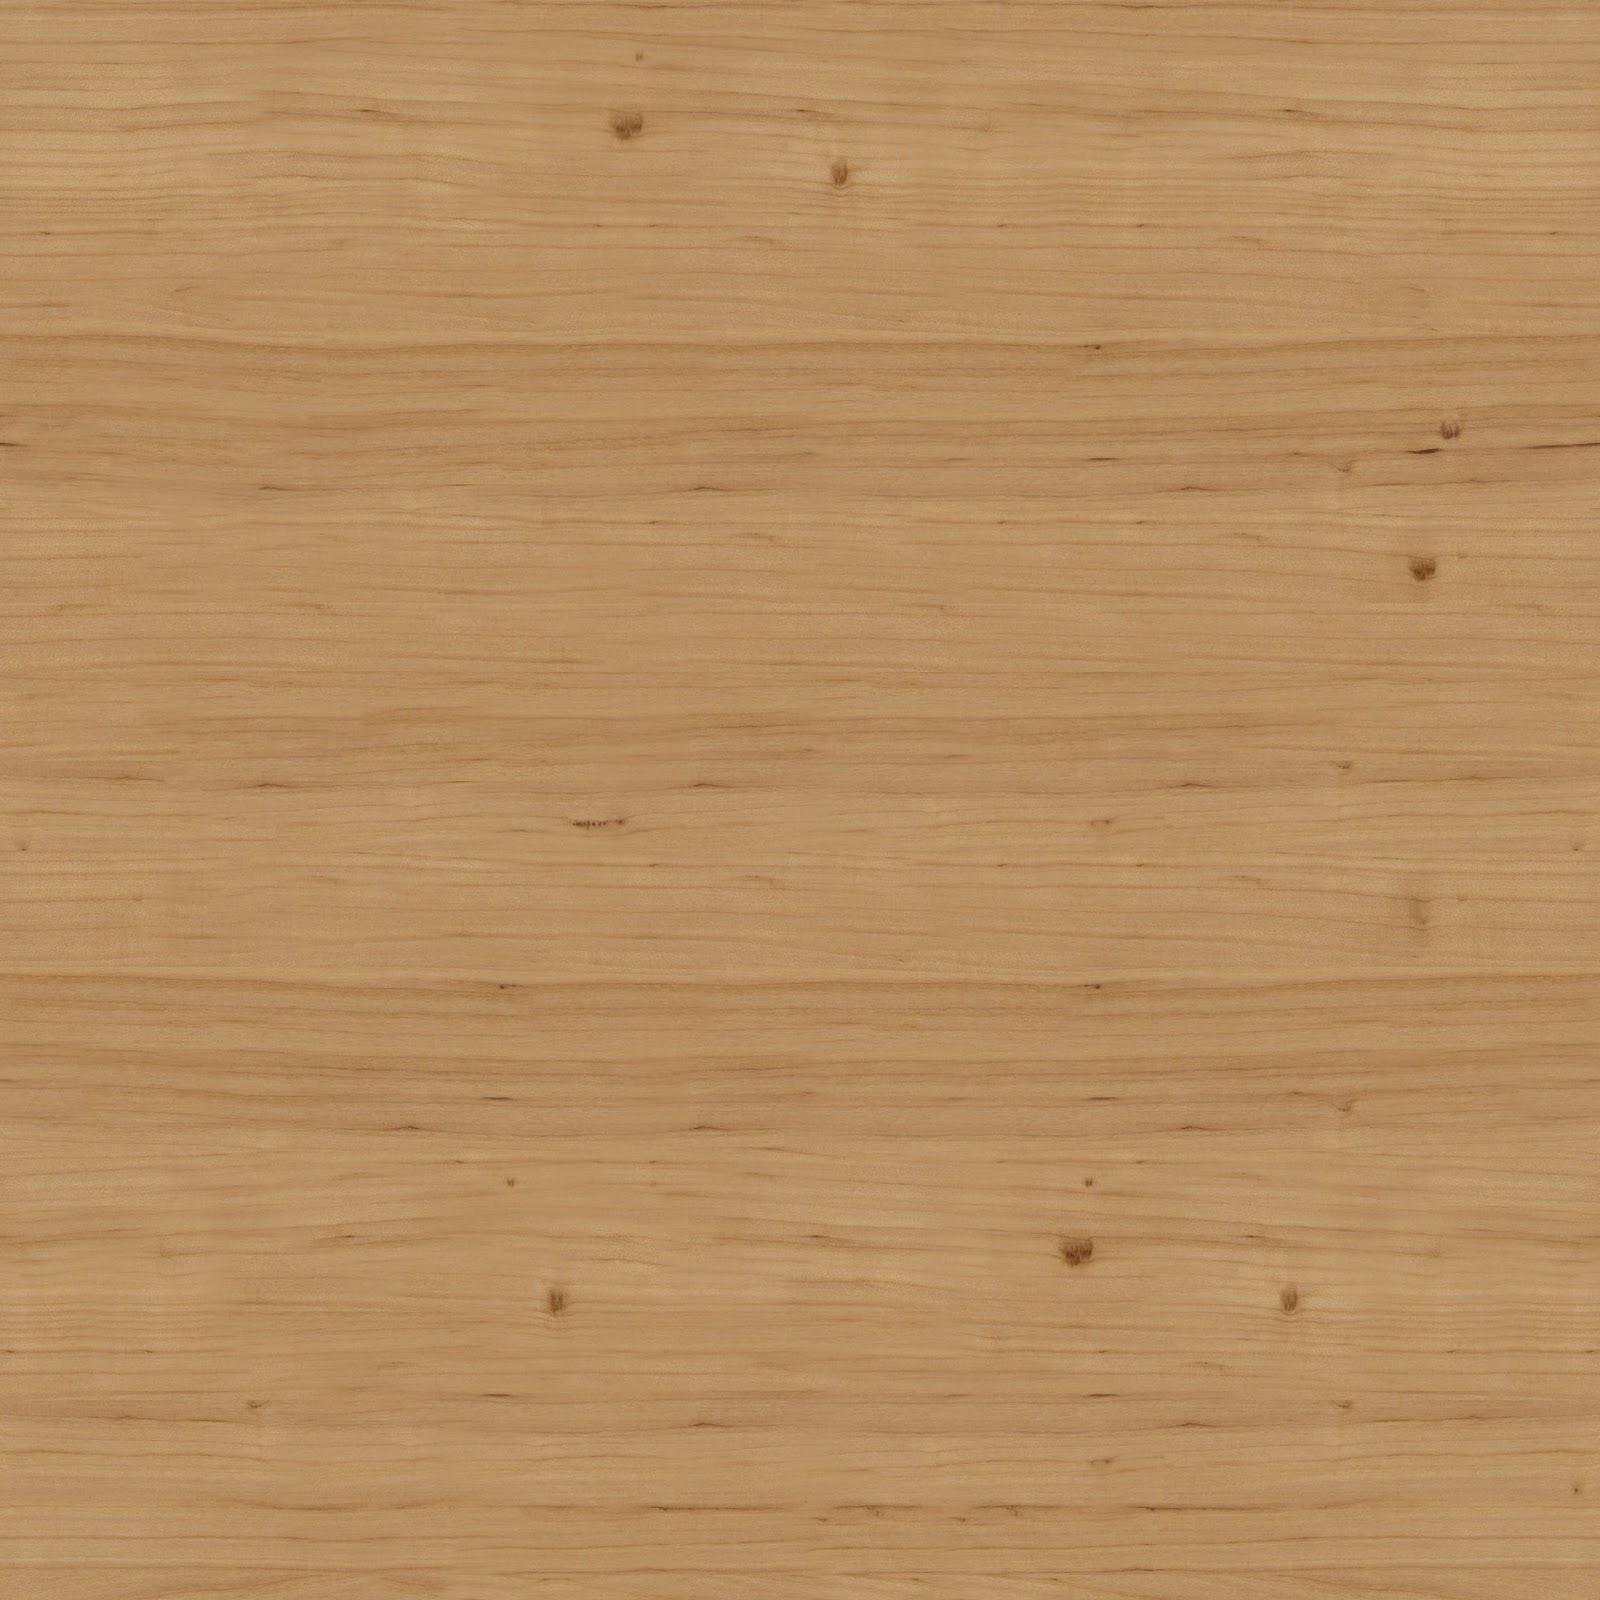 Simo texture seamless legno naturale for Legno chiaro texture